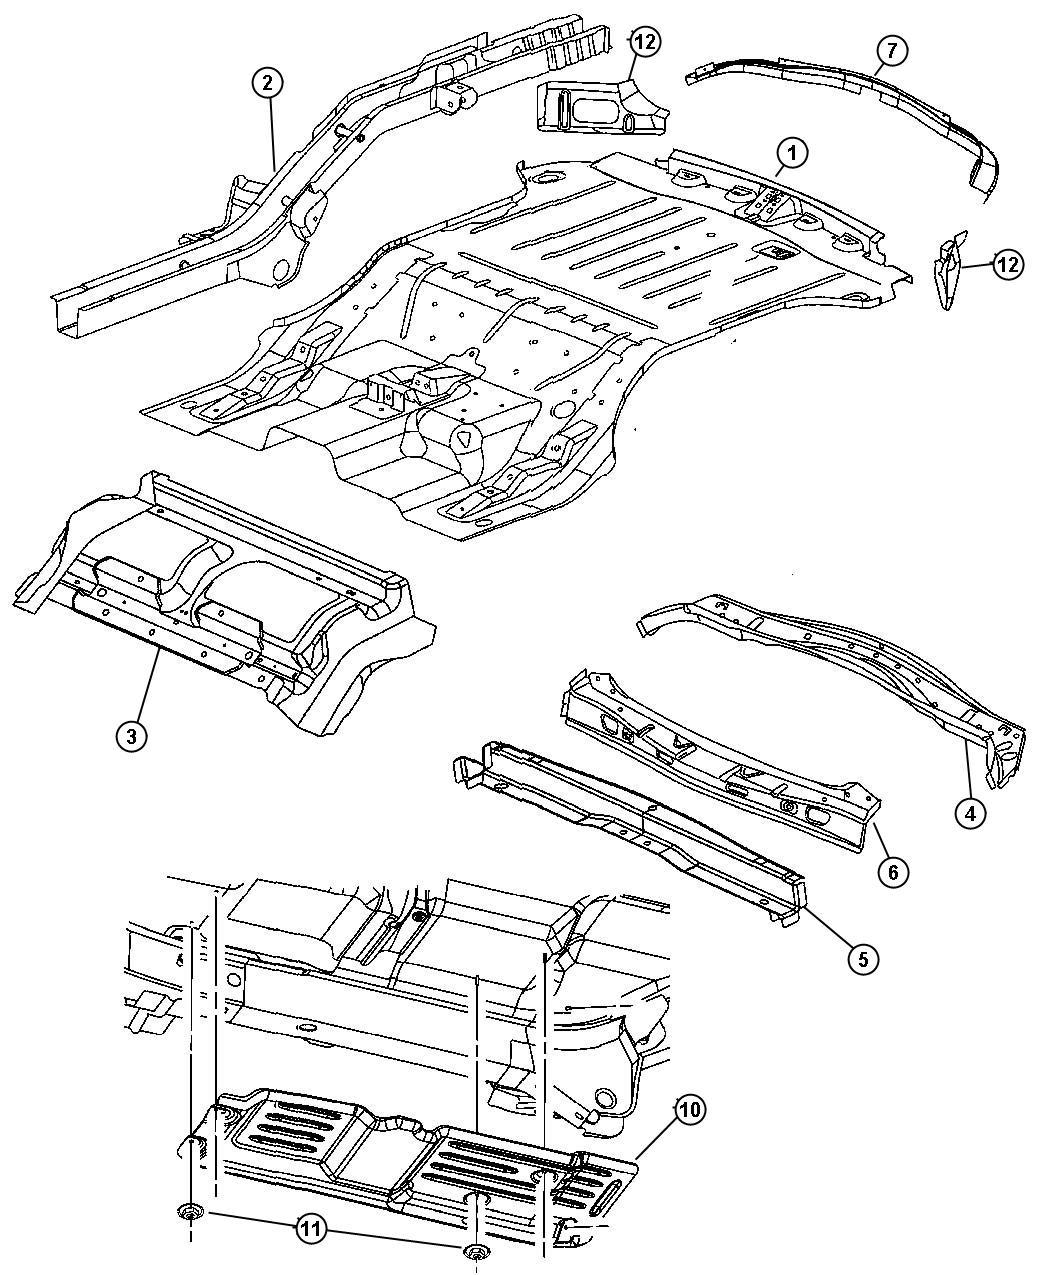 Jeep Grand Cherokee Pin Push Pin M11 4 M8x21